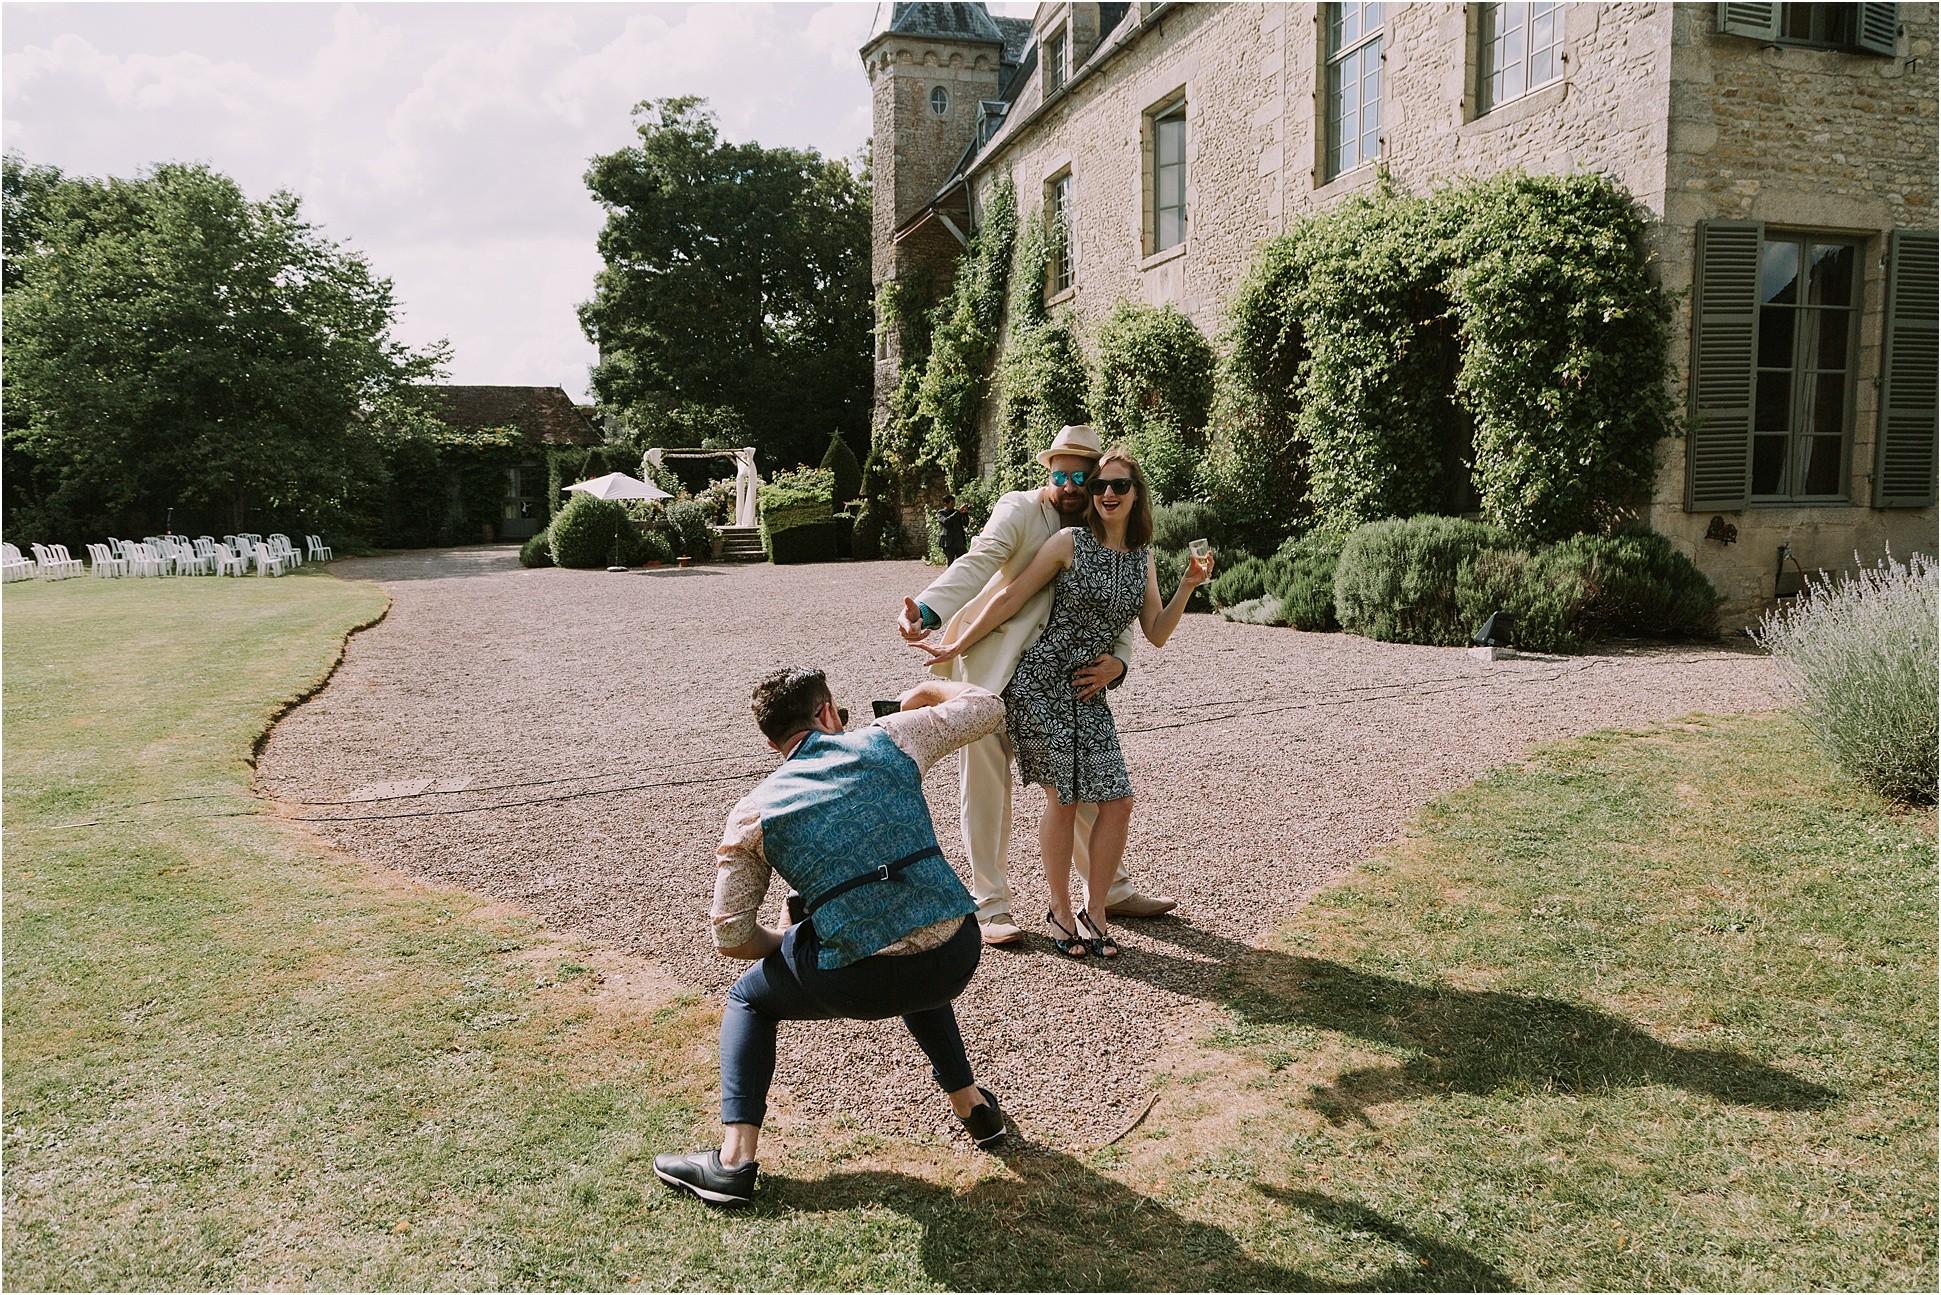 Kateryna-photos-photographe-mariage-chateau-st-paterne-mayenne-normandie_0128.jpg